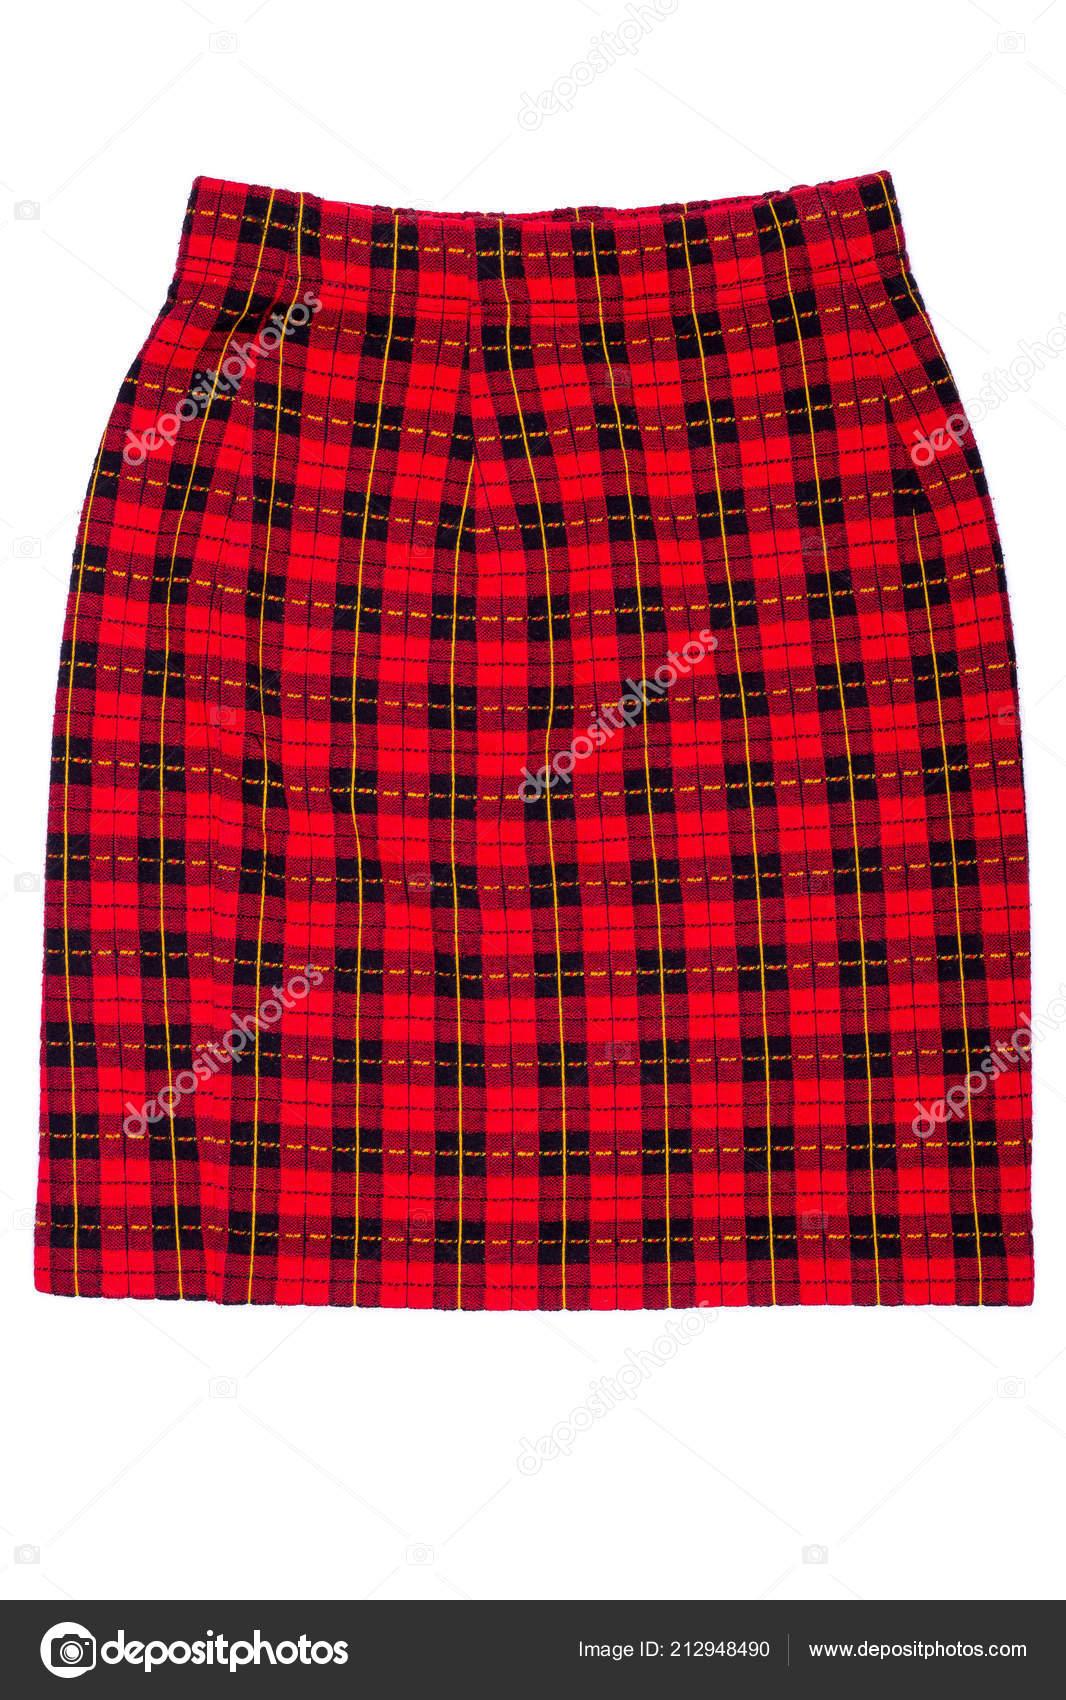 267443e6eeb22e Red Checkered Skirt White Background Isolate Skirt Black Red Cells — Stock  Photo